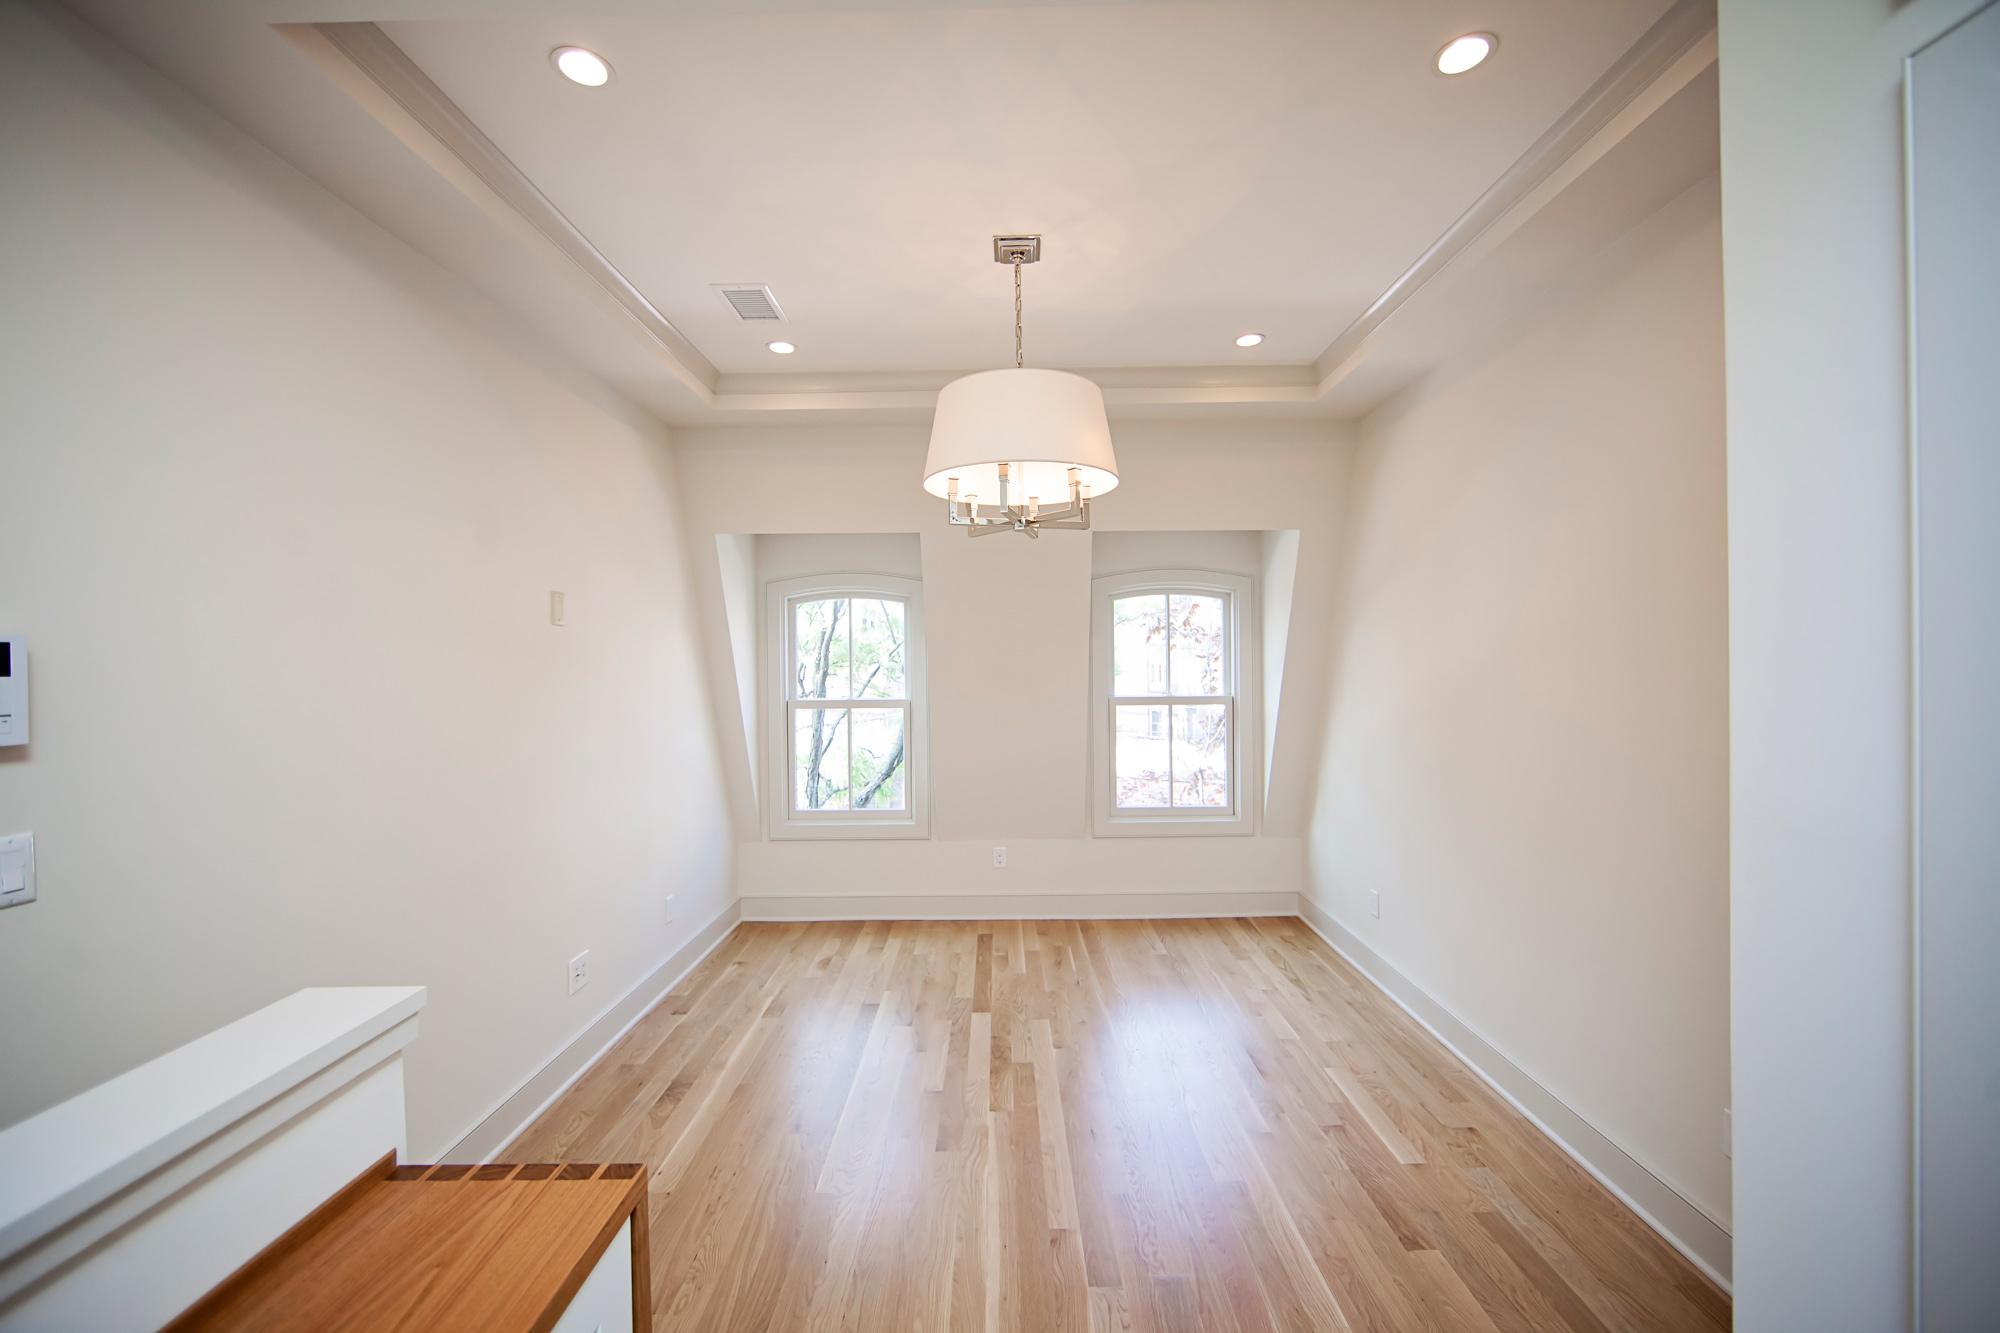 thompson-fine-home-renovations-hoboken-new-jersey-construction-7.jpg